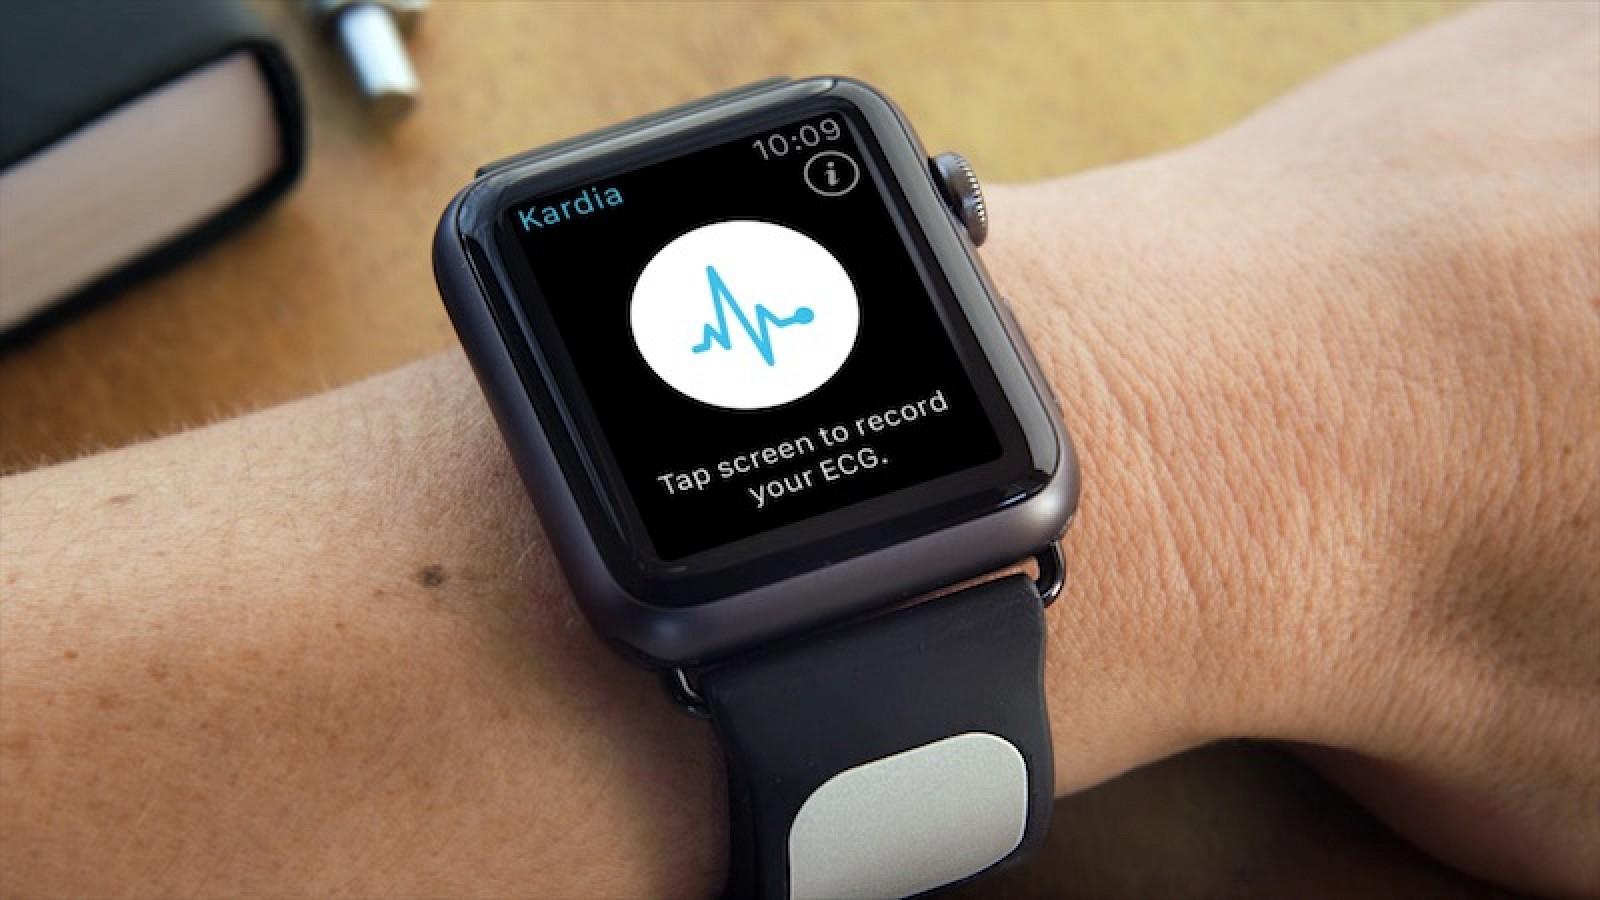 336746205fa AliveCor 'Kardia Band' Medical Grade EKG Analyzer for Apple Watch Receives  FDA Approval - MacRumors